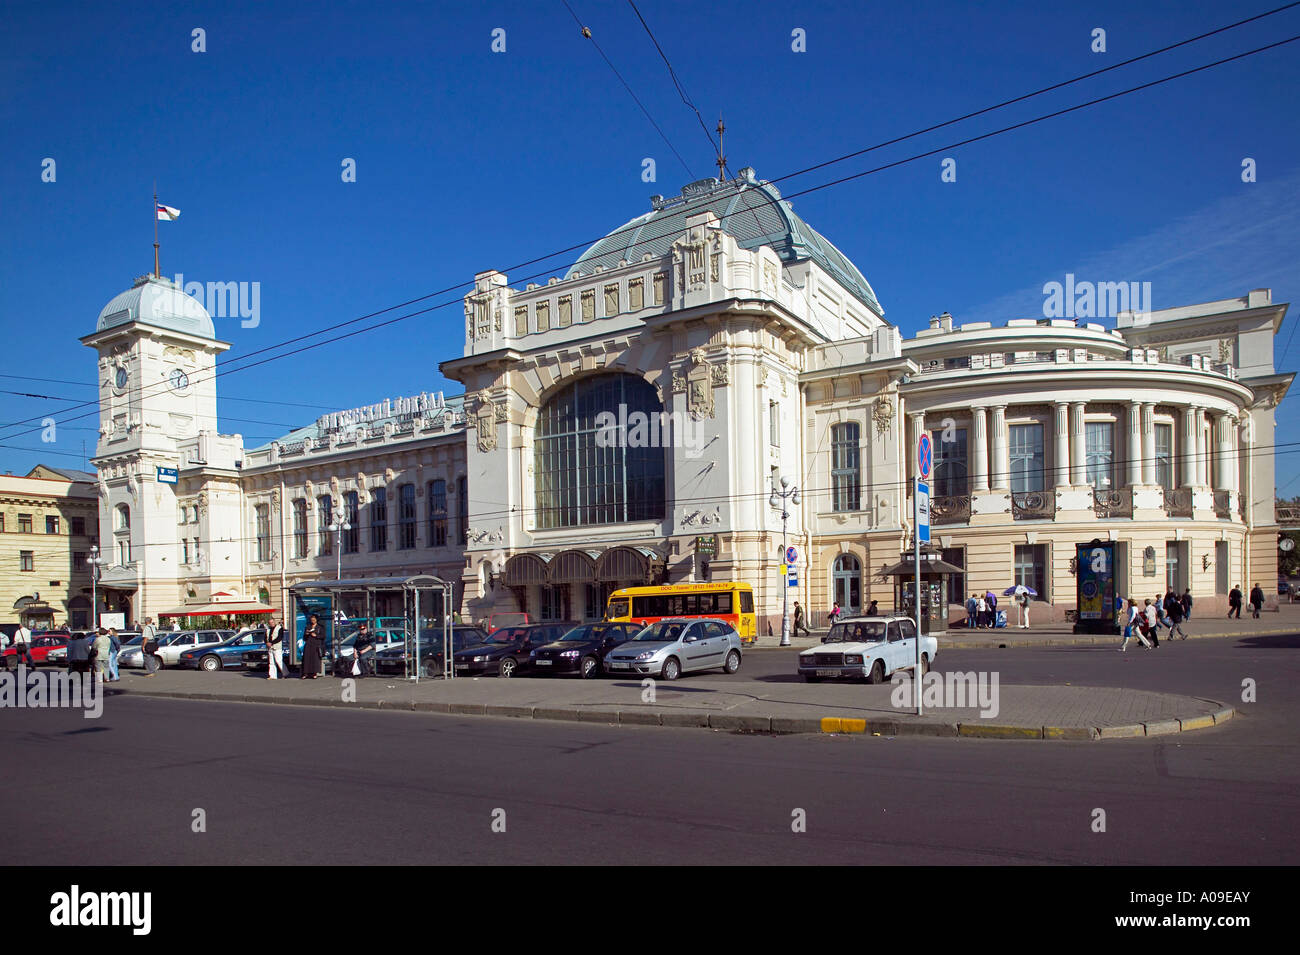 Sankt Petersburg, Witebskij Bahnhof, Saint Petersburg Witebskij Train Station - Stock Image